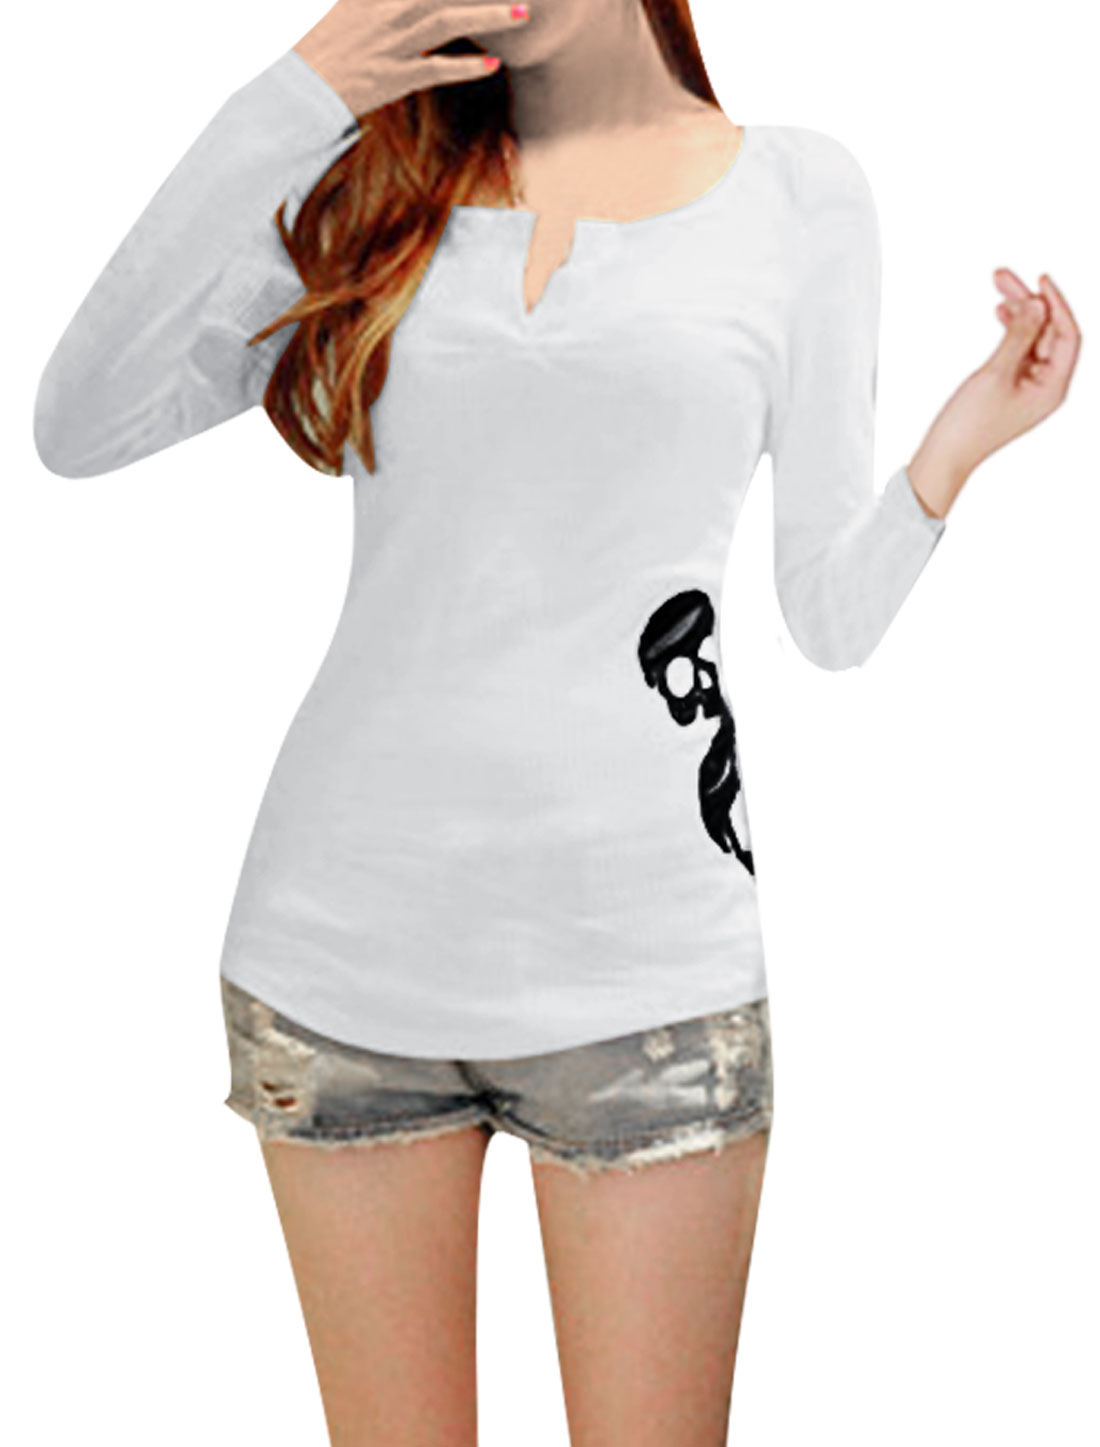 Ladies Skull Printed Split Back Hem Details Stretch Ribbed White Blouse XS